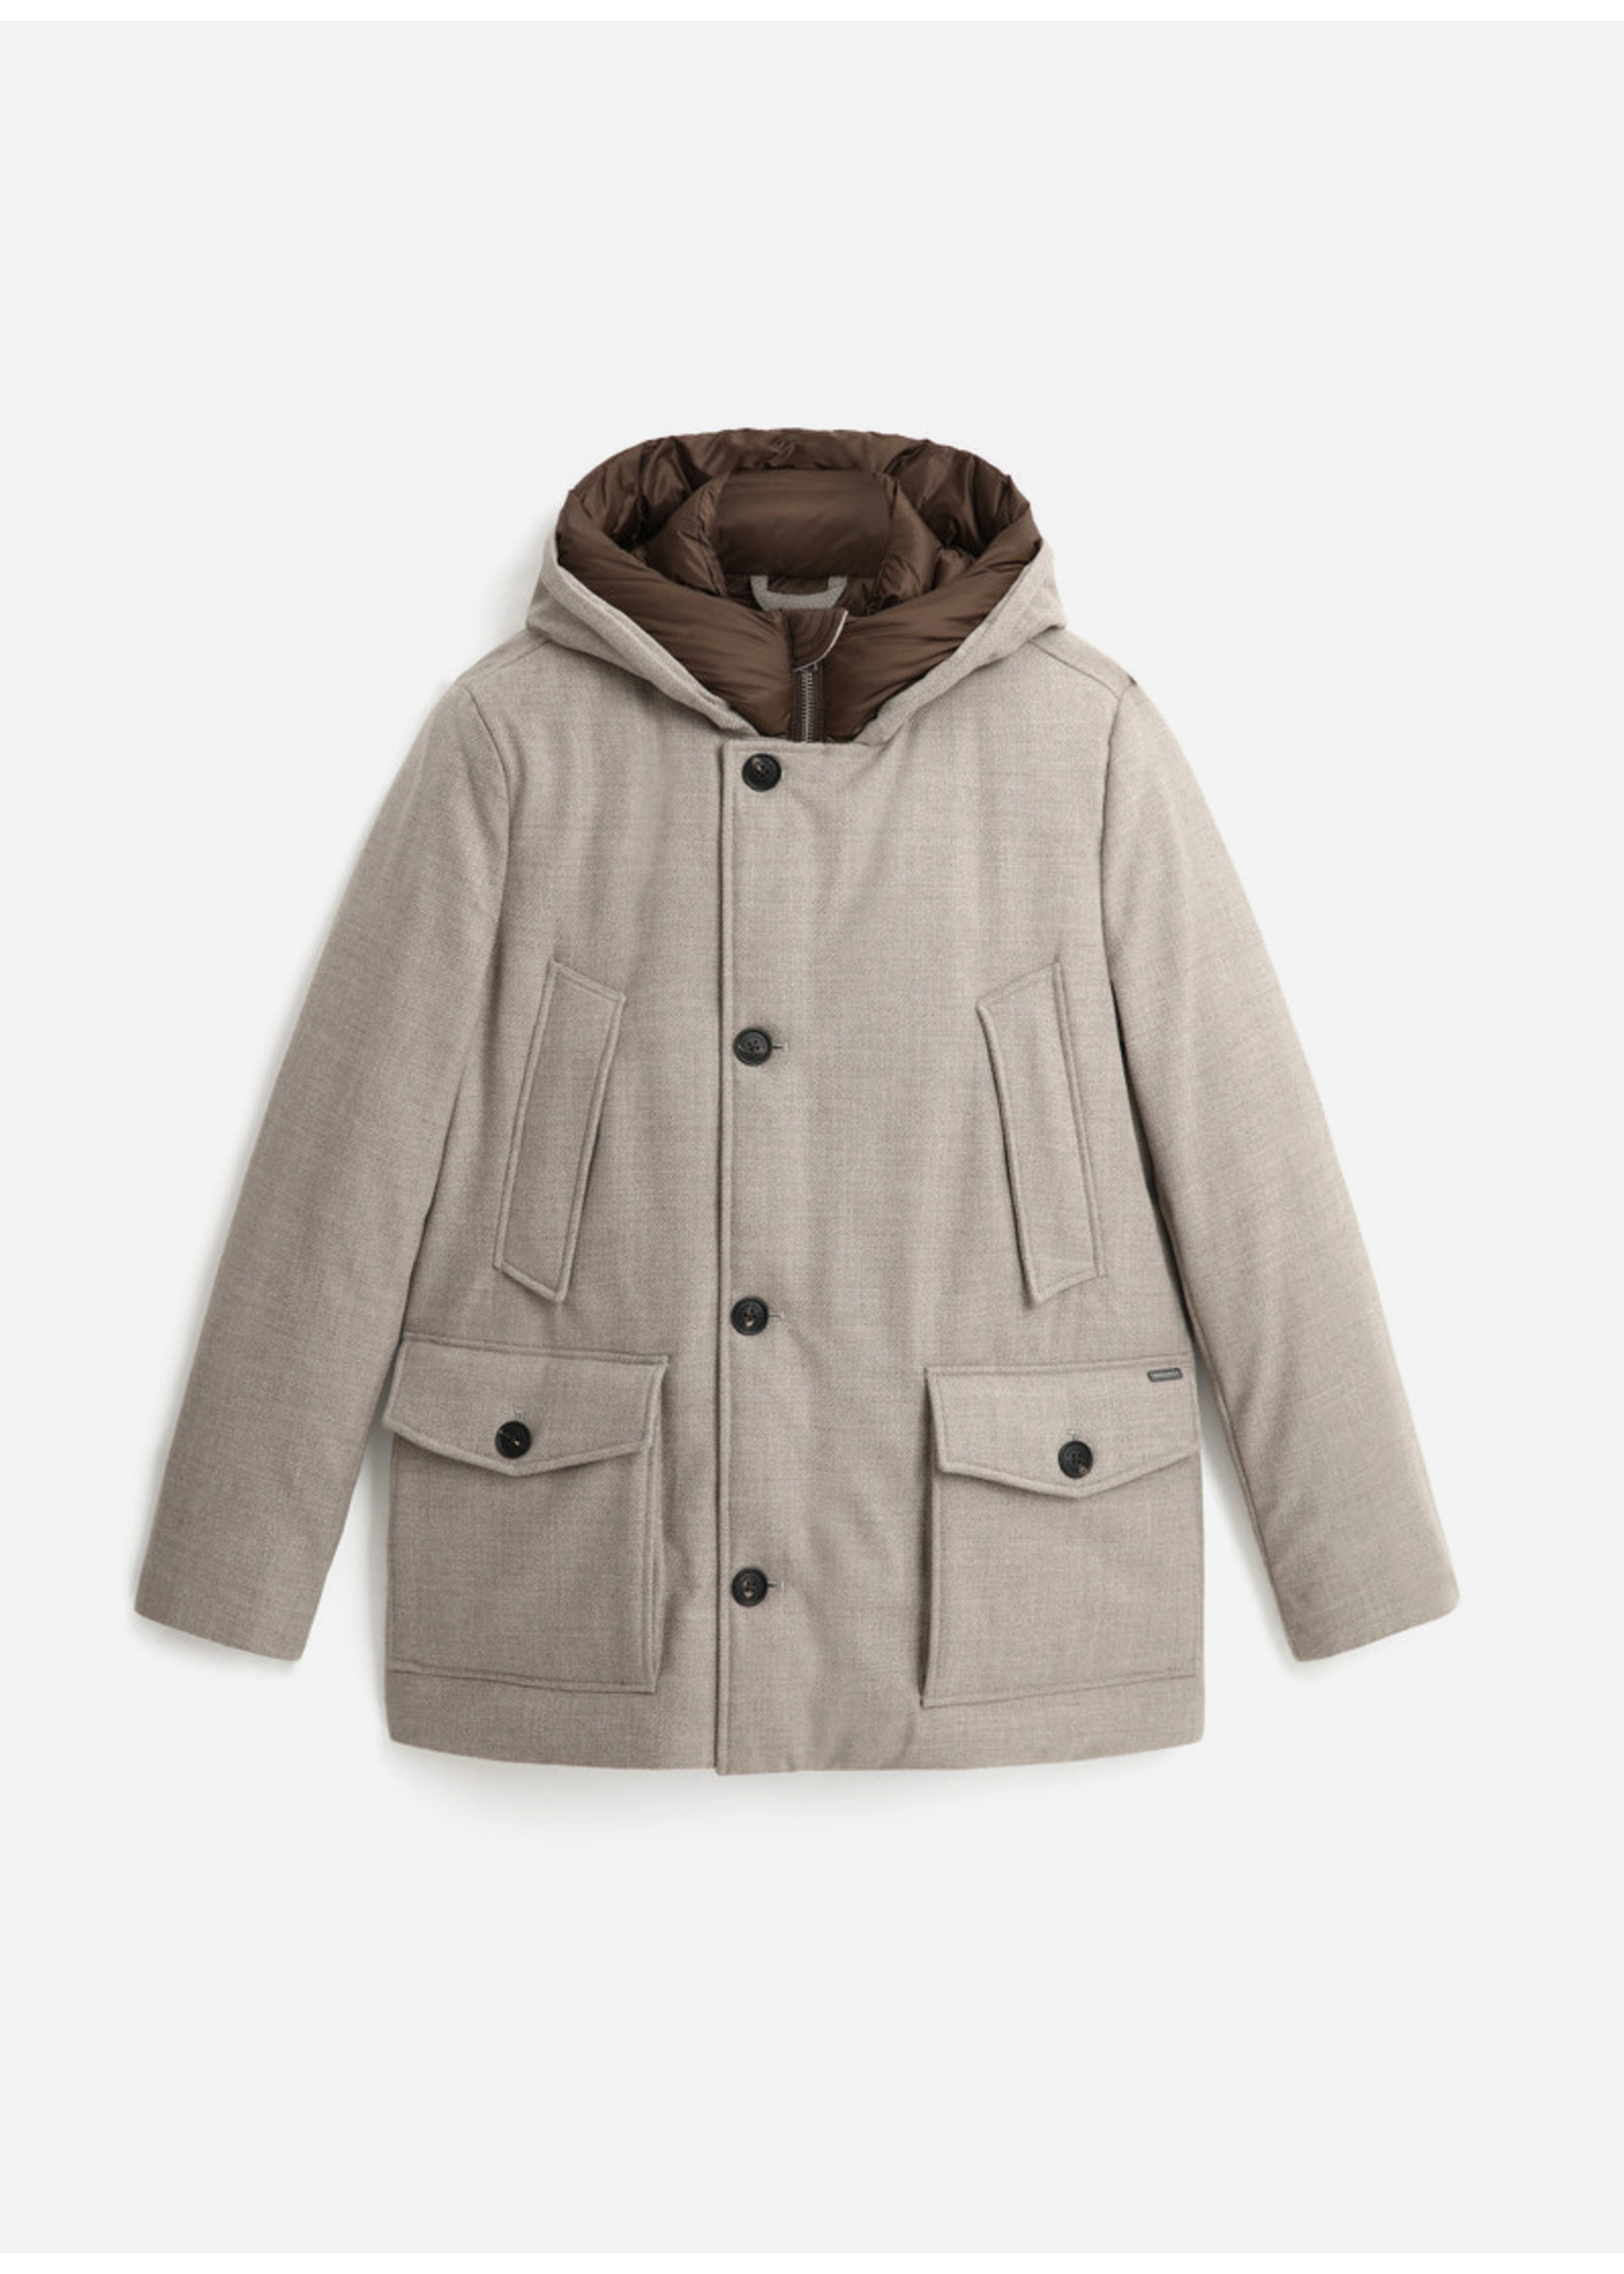 Woolrich Arctic Luxury Eco Wool Parka Black Sheep Beige